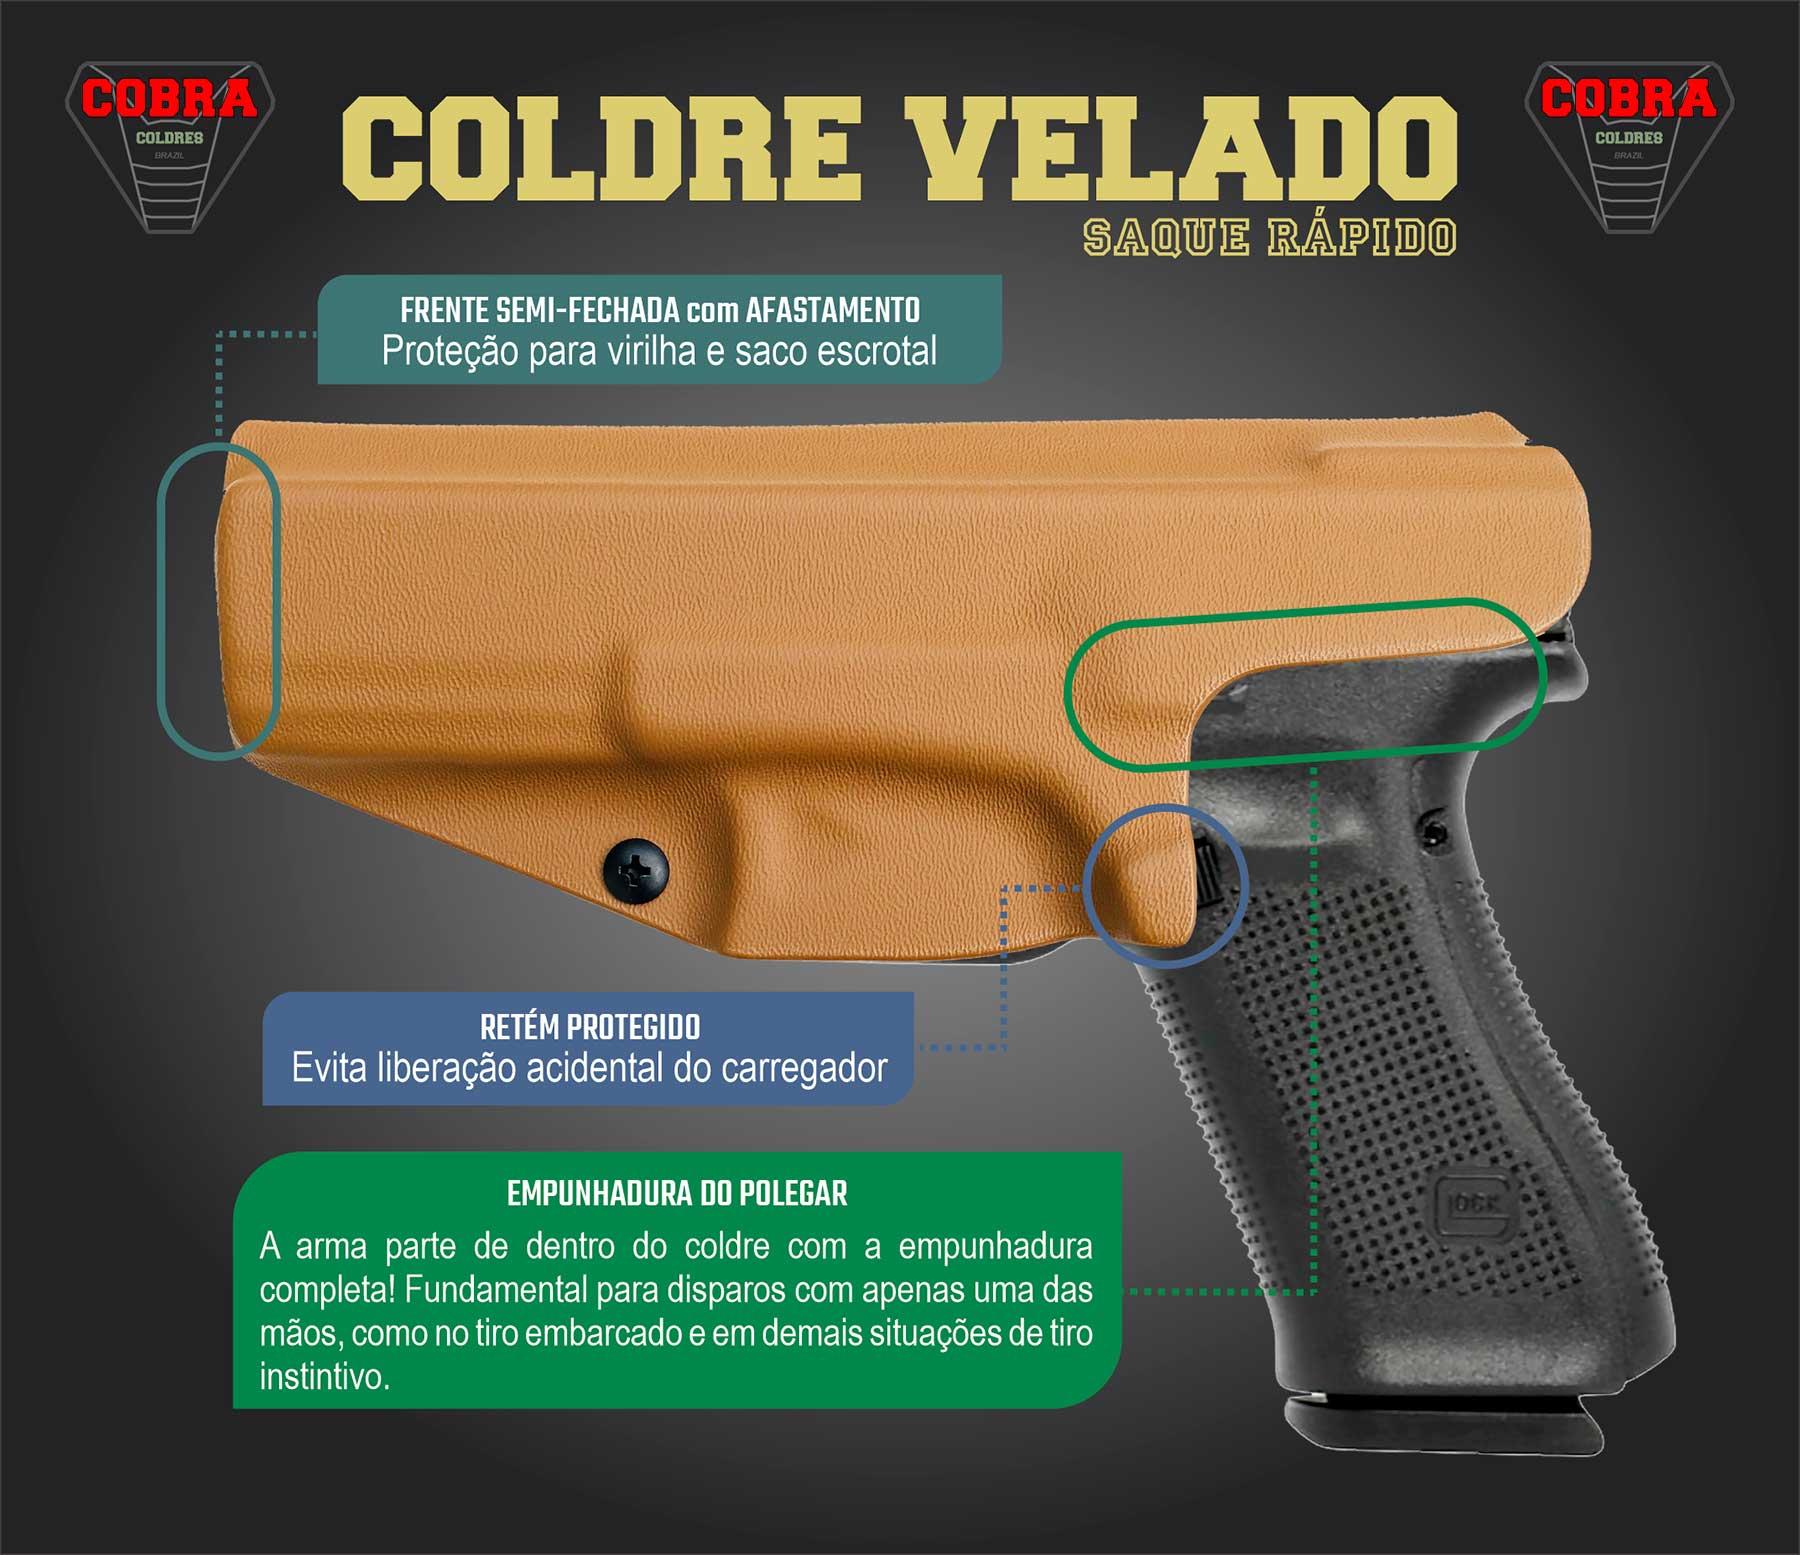 Coldre  [Arex] [Delta] [9mm] [Rex Delta] Kydex + 2 Porta-Carregadores Universais - Saque Rápido Velado Kydex® 080